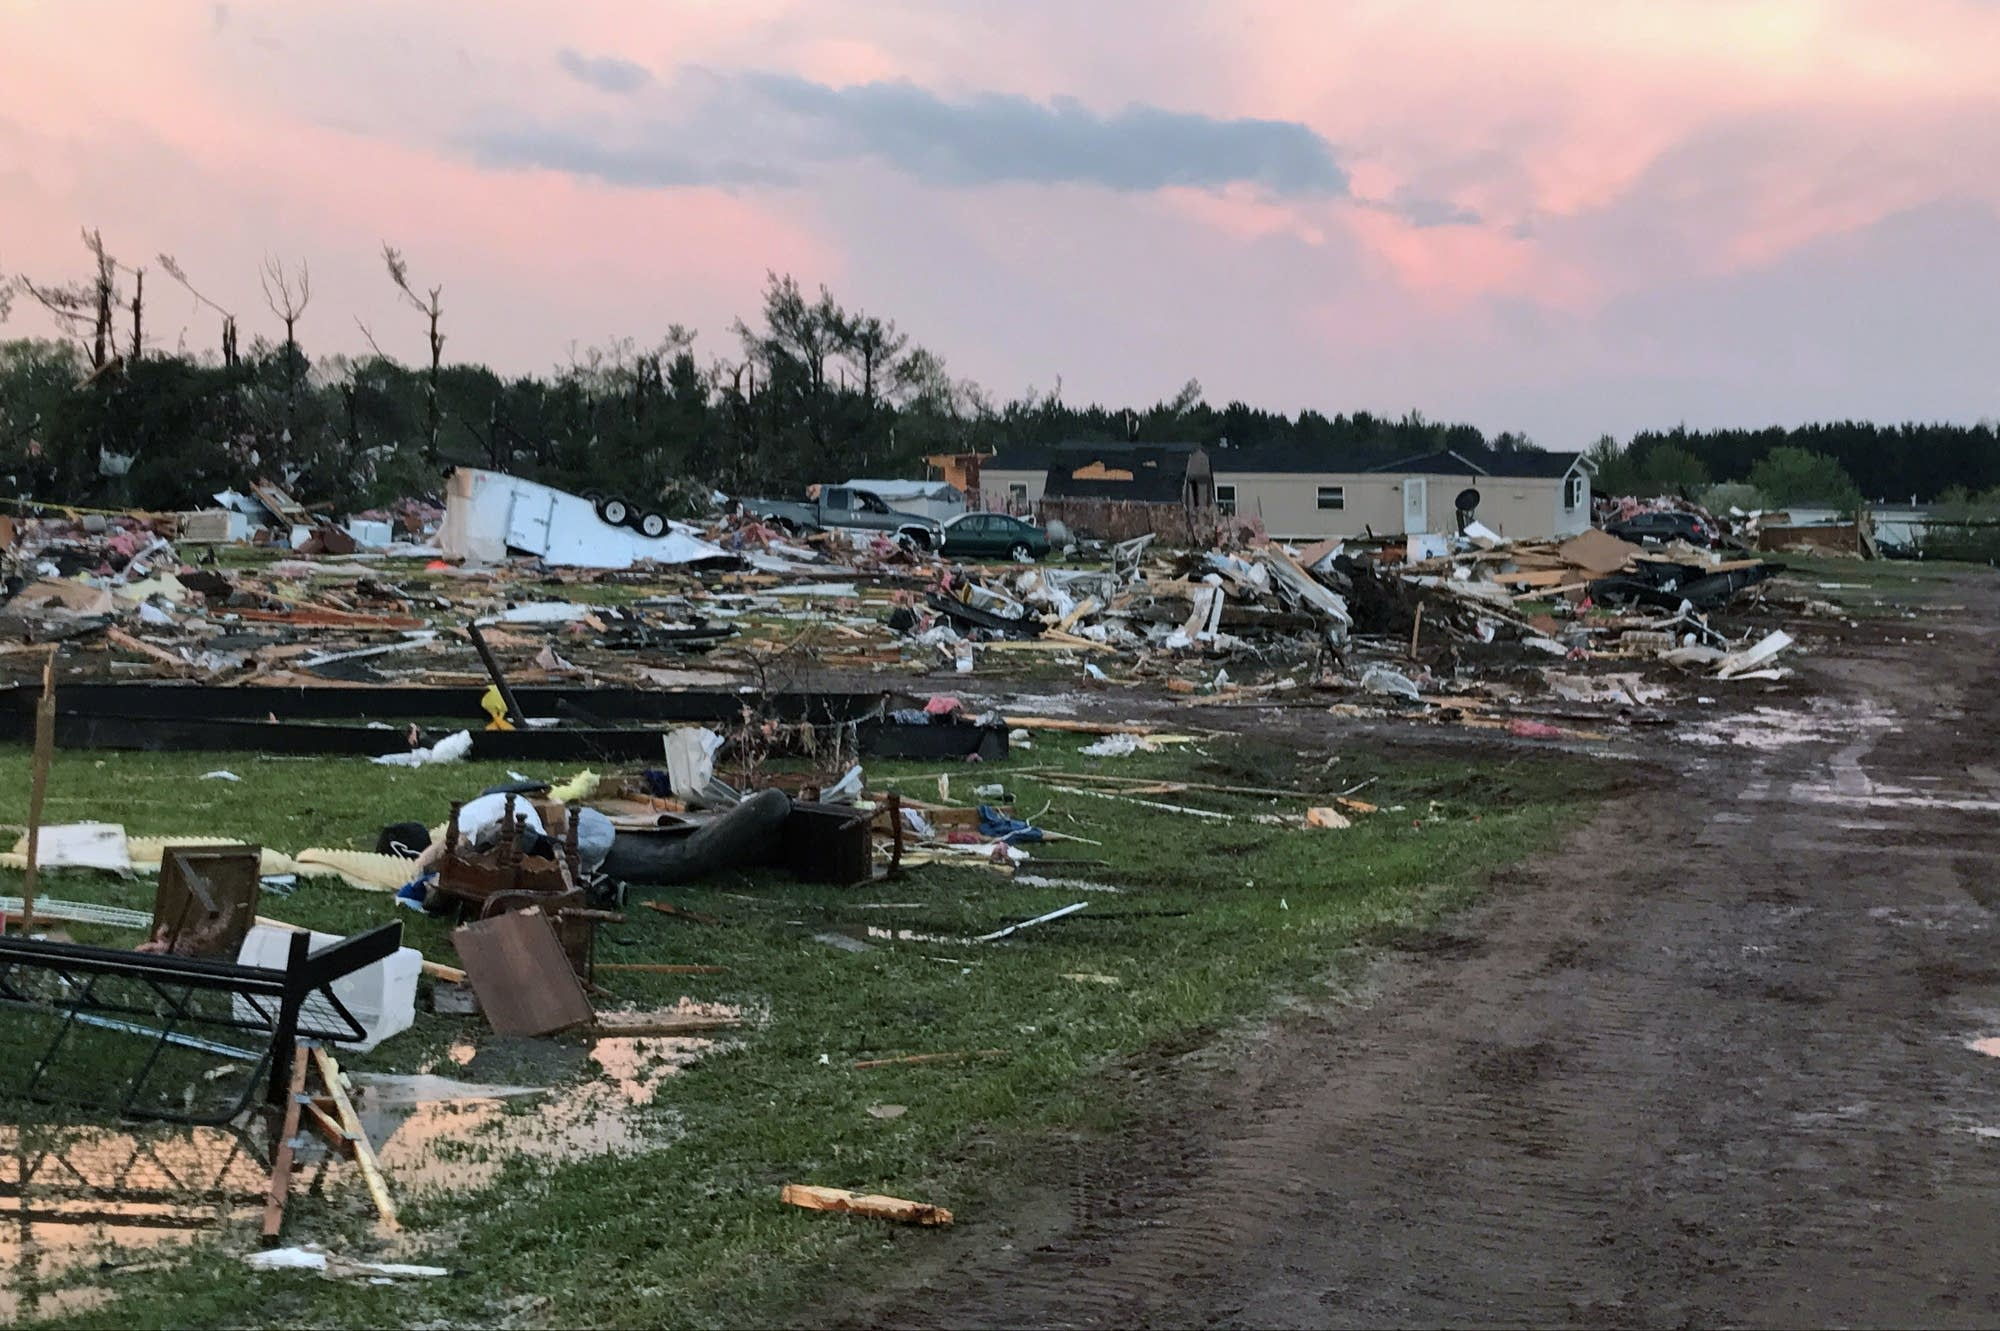 Tornado damage in Barron County, Wisconsin.